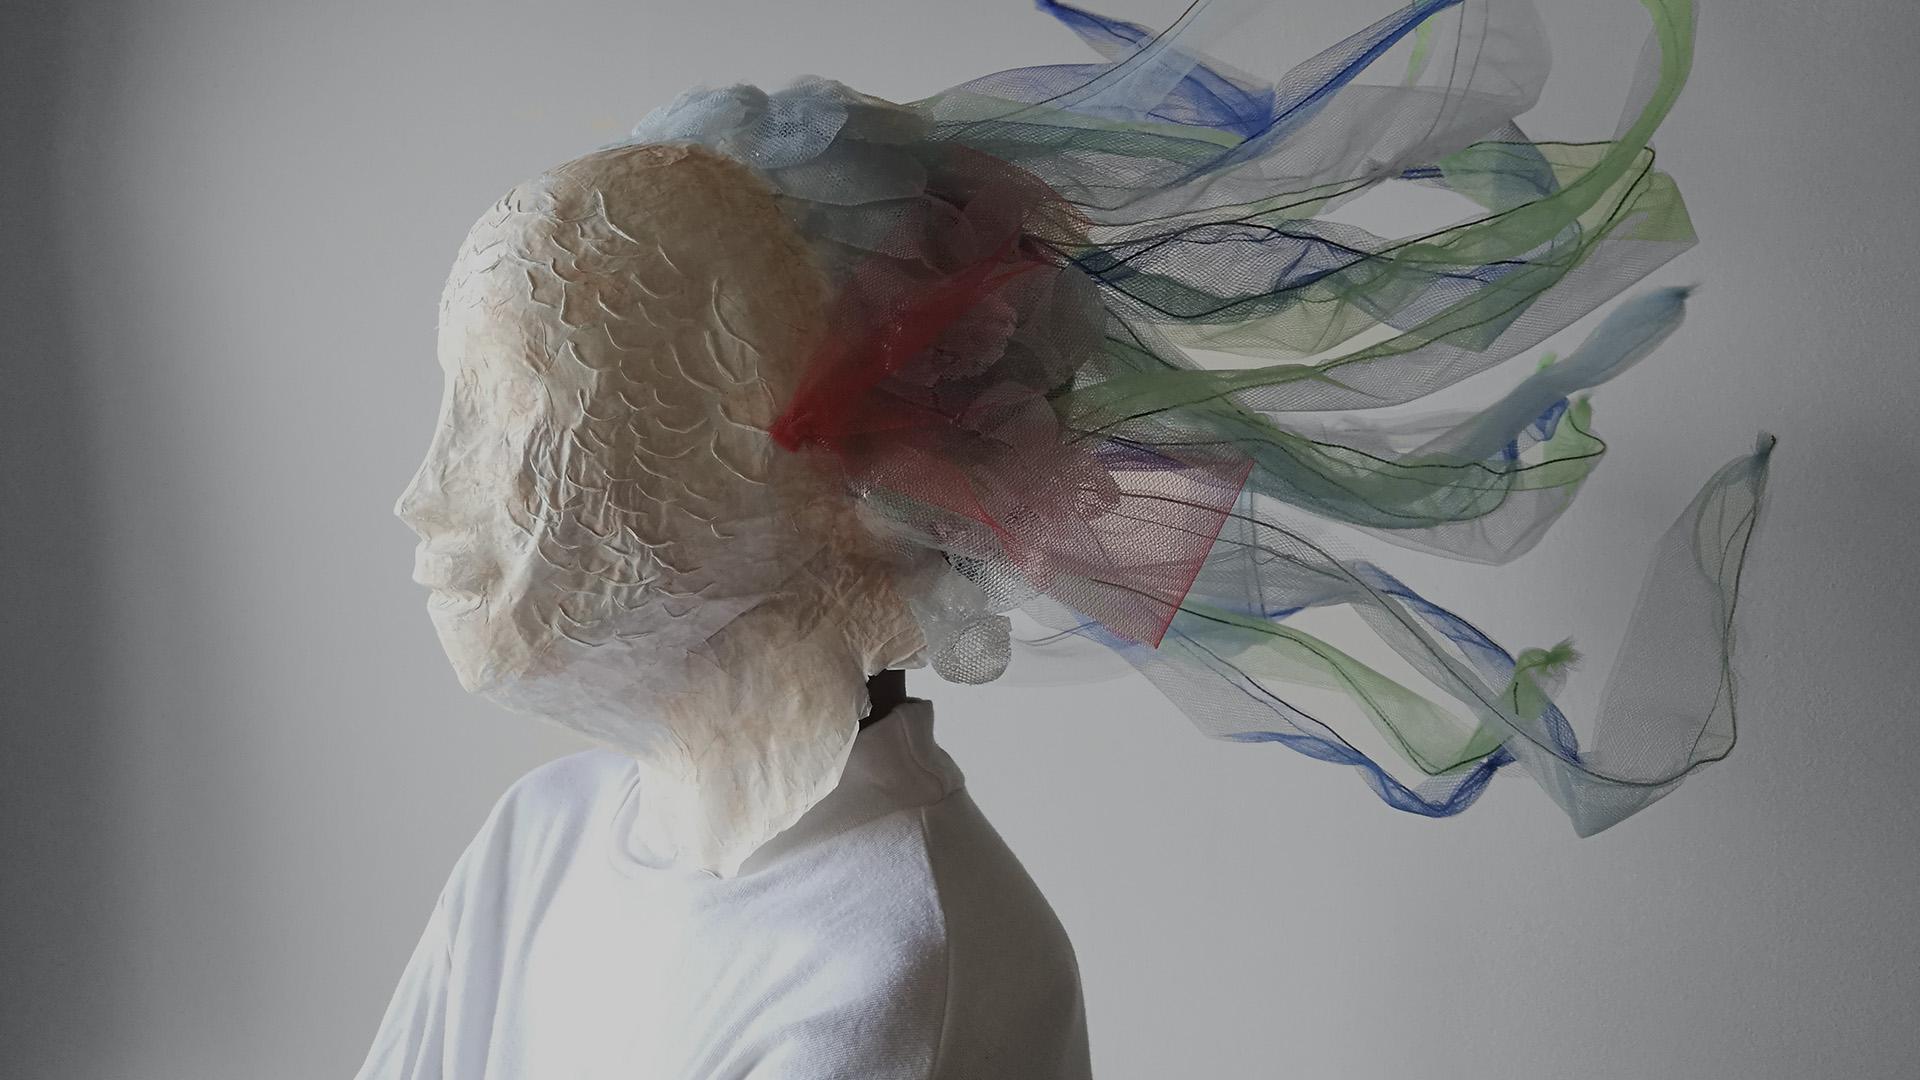 Valentina Trovato - Visioni. Trucco e maschera teatrale 2020